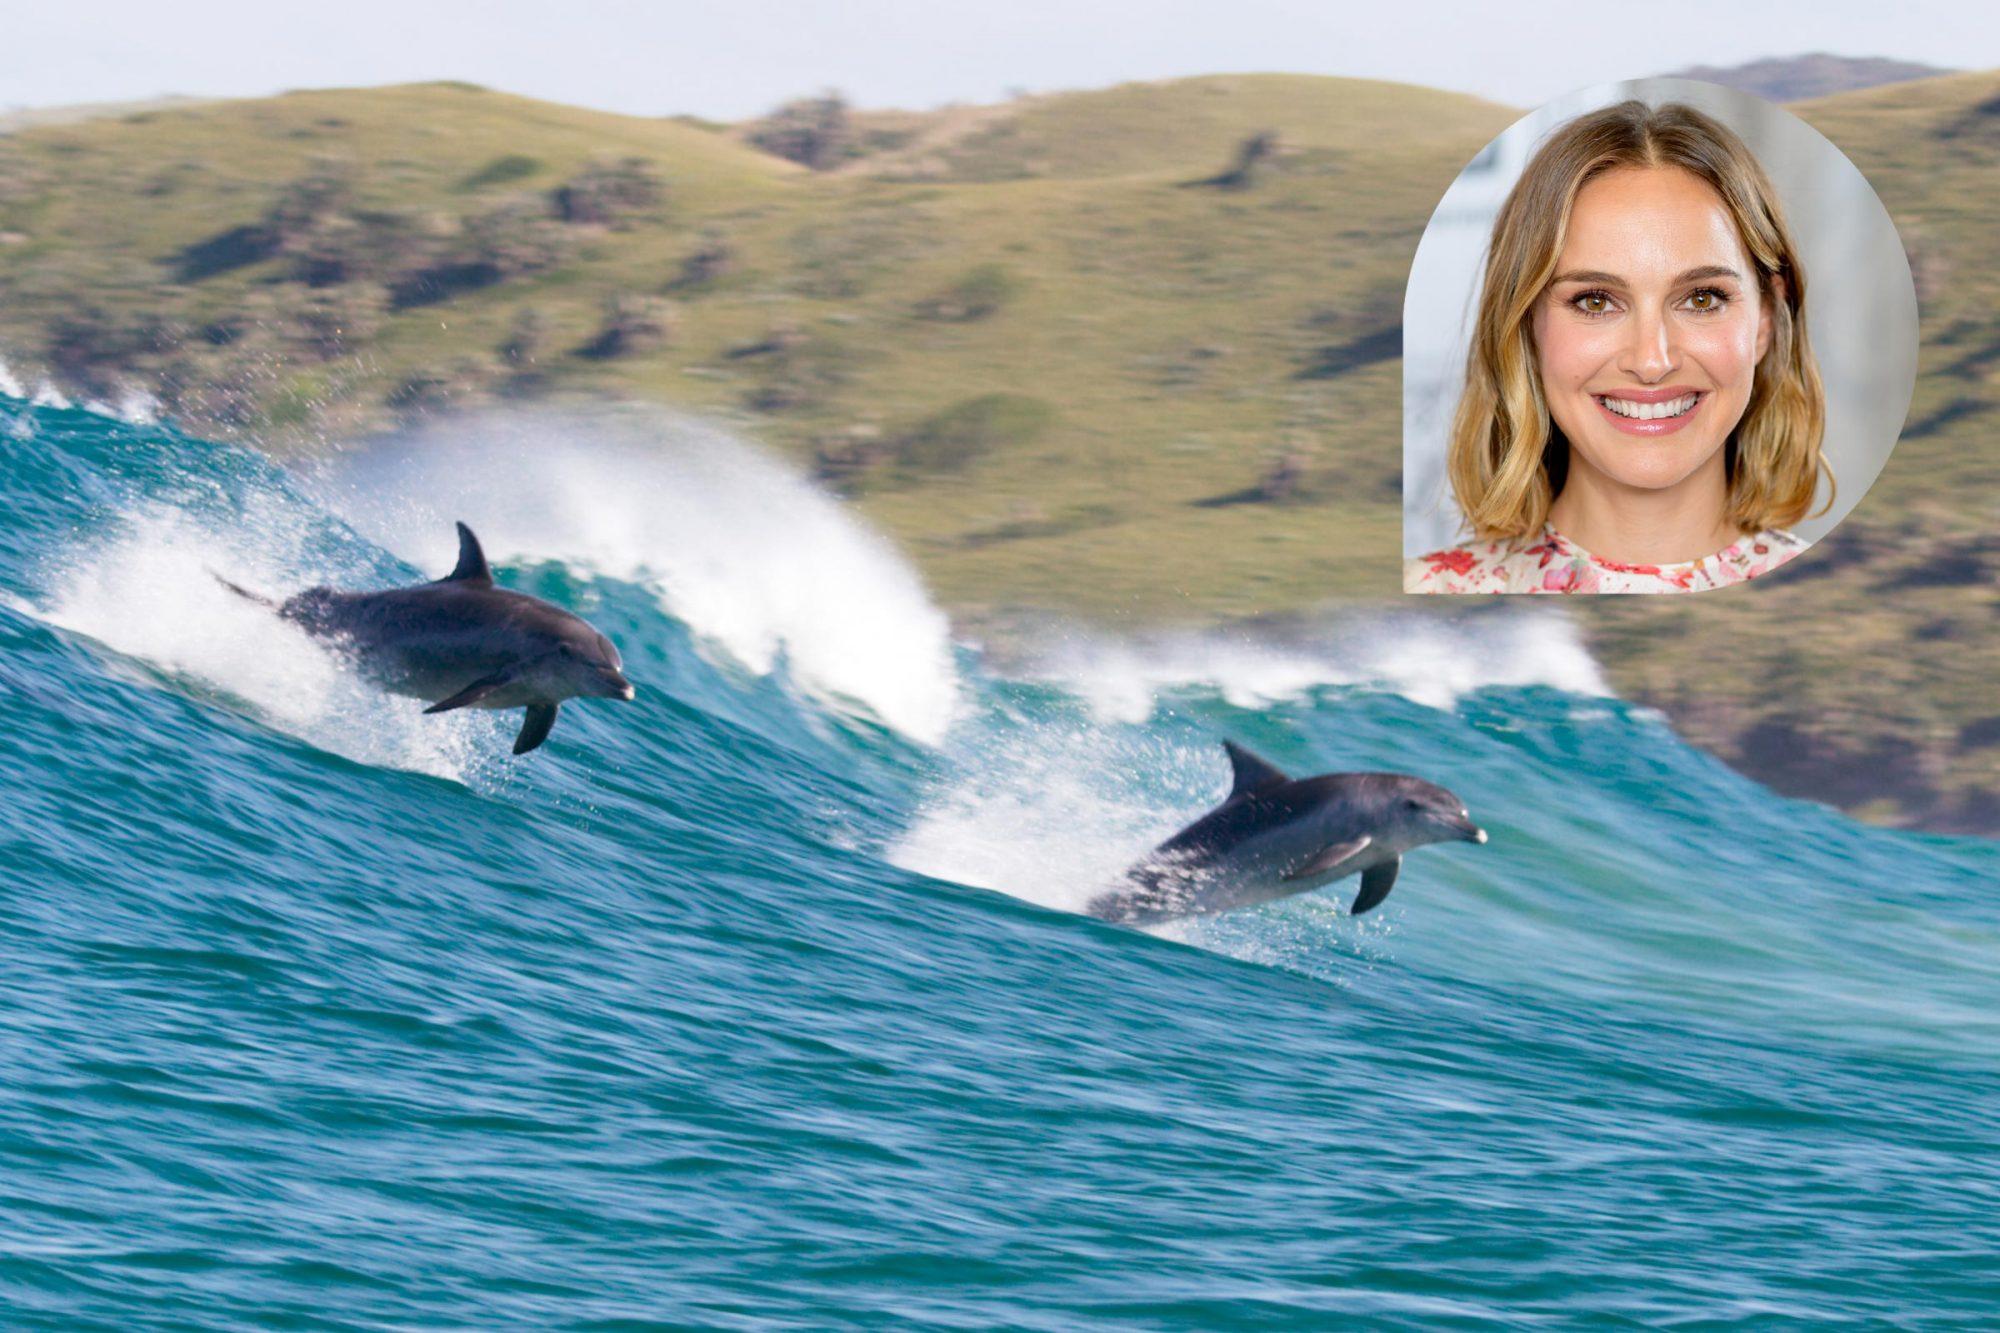 Dolphin Reef; Natalie Portman